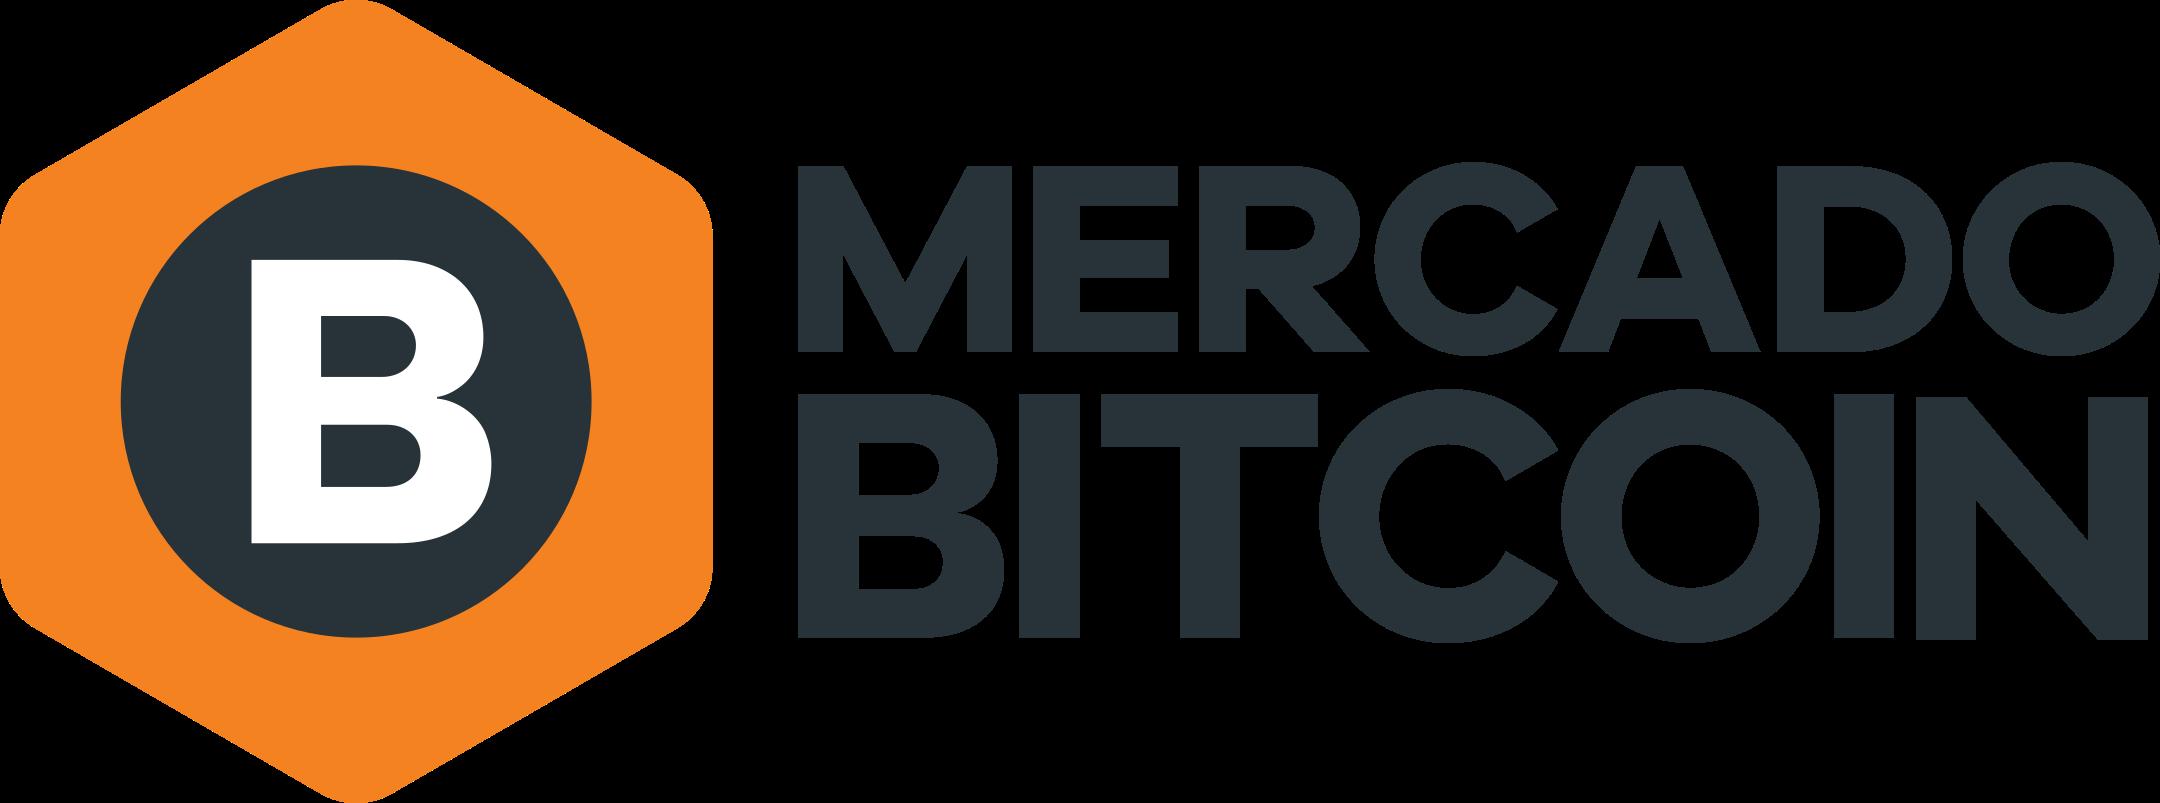 mercado bitcoin logo 1 - Mercado Bitcoin Logo